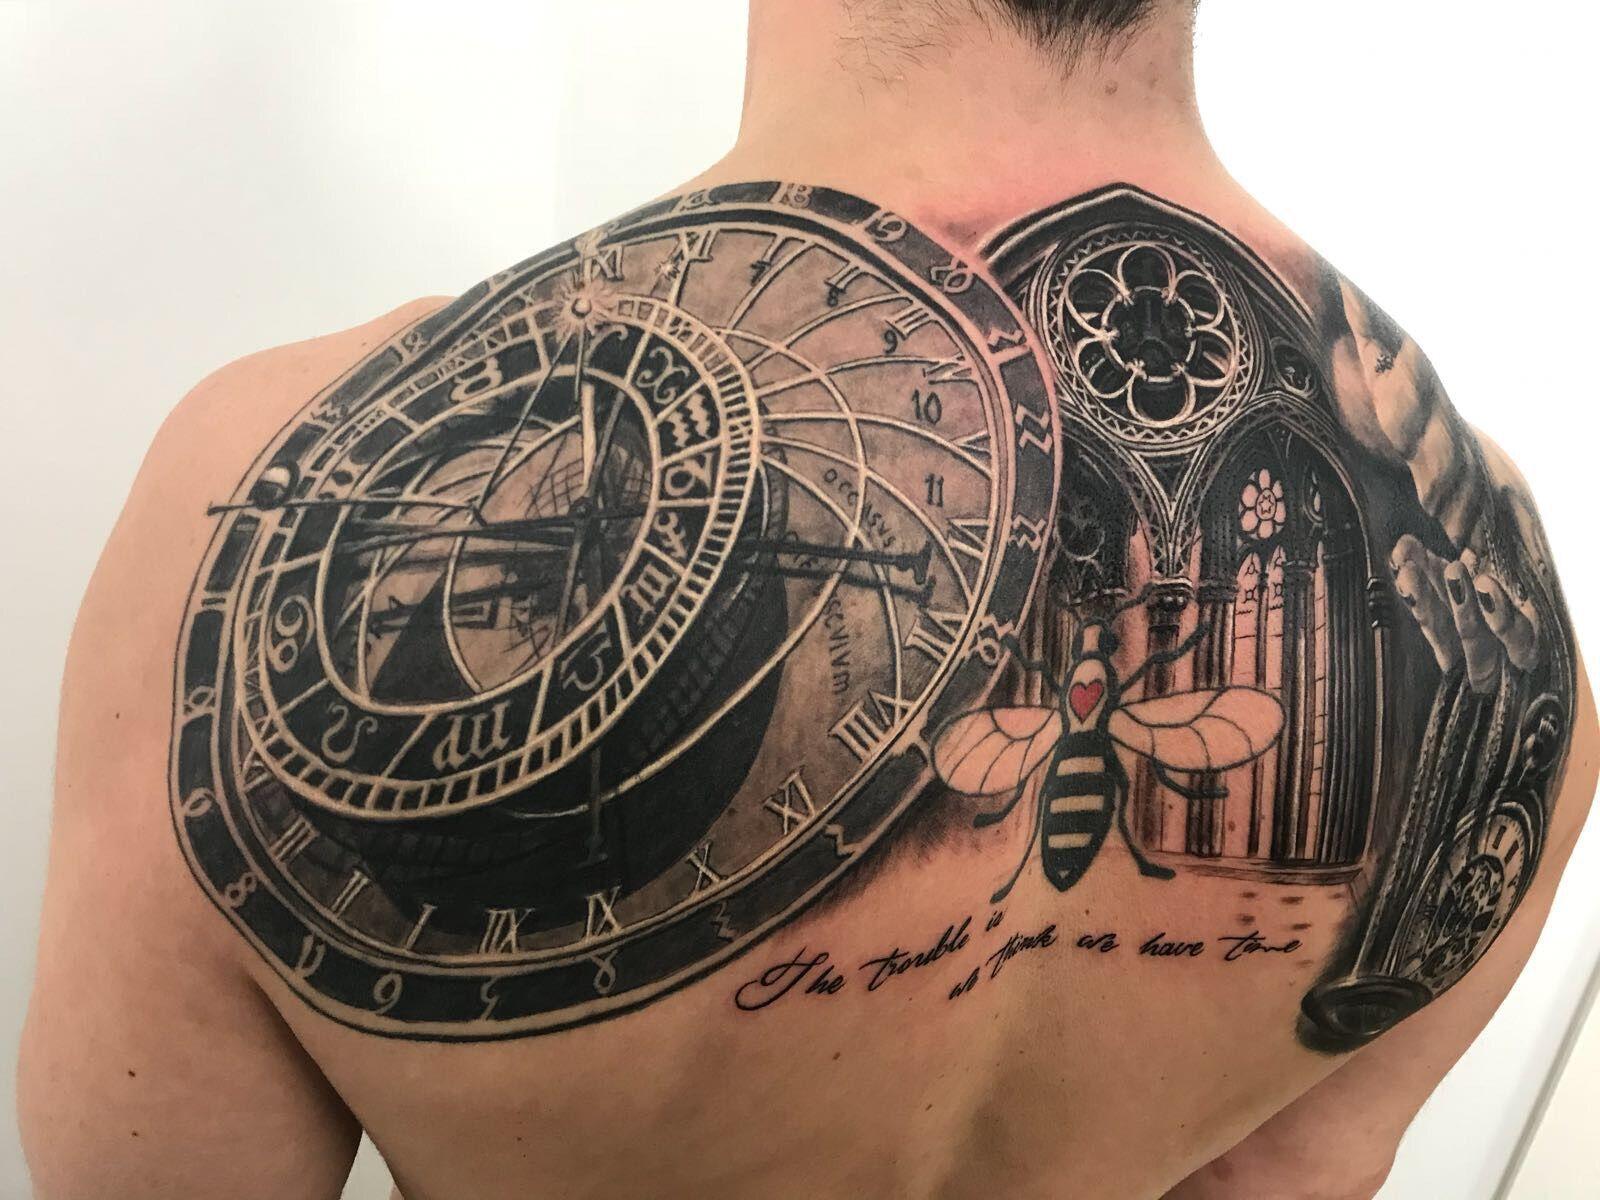 Clock Back Piece Tattoo By Stefan Limited Availability At Holy Trinity Tattoo Studio Back Piece Tattoo Tattoos Z Tattoo